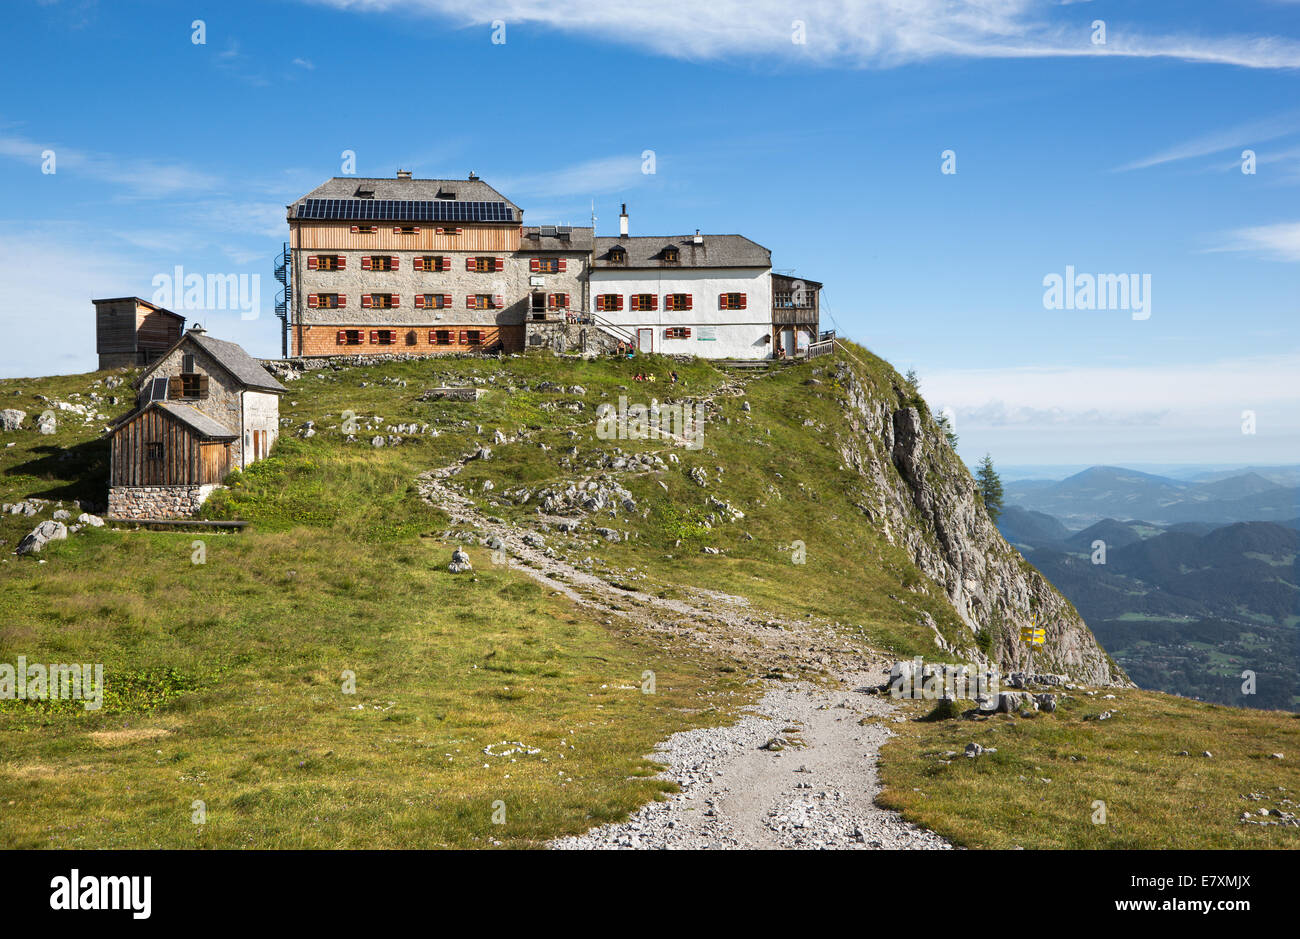 Alps - Chalet Watzmannhaus in the north calcite alps - Bavaria - Germany - Stock Image